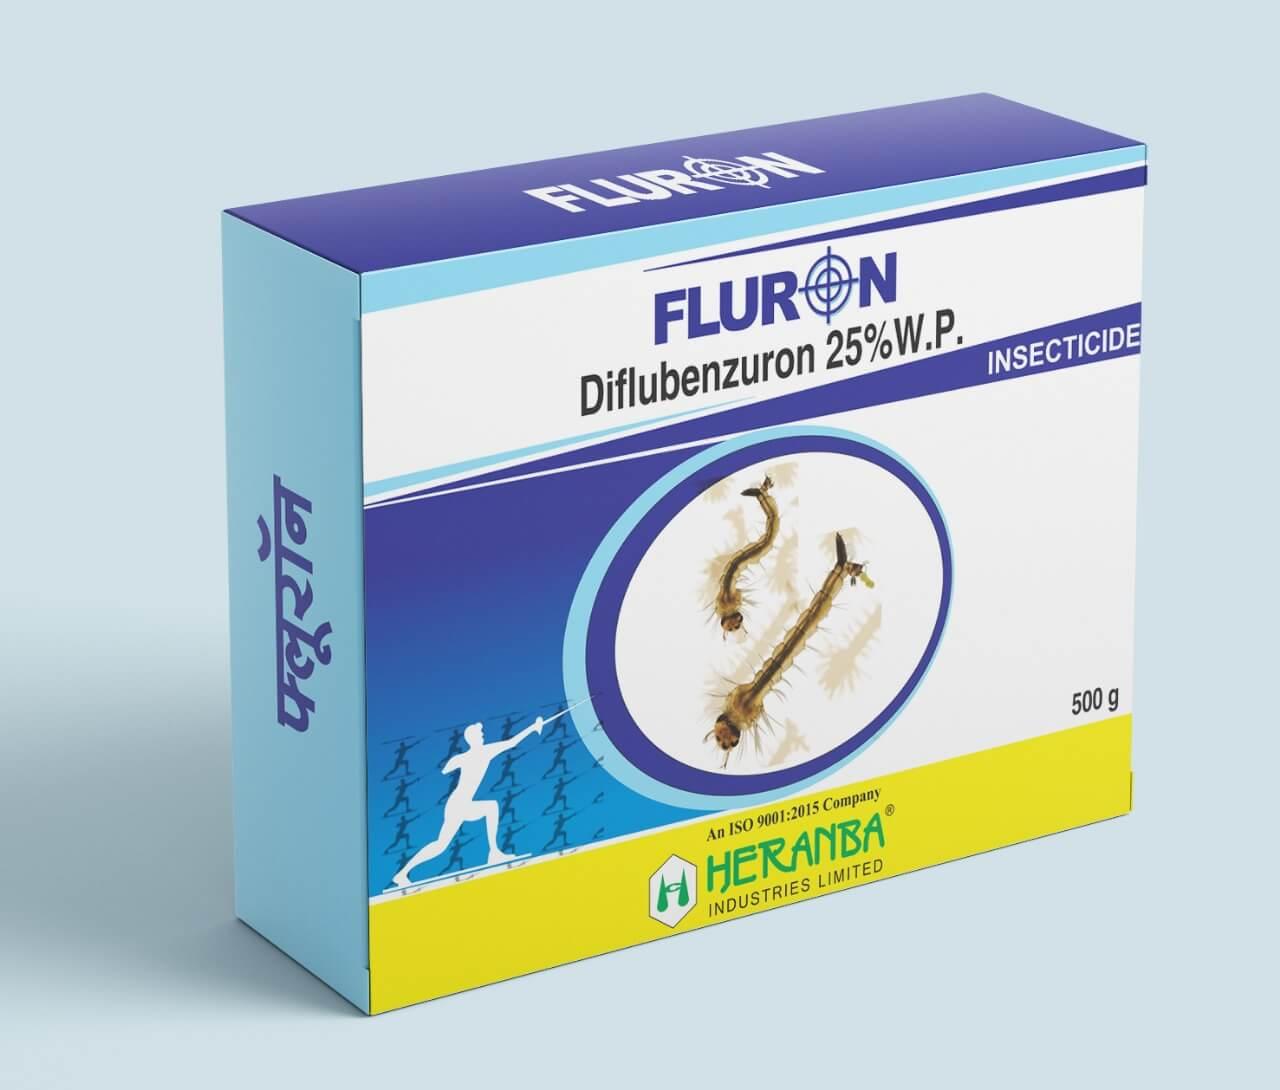 FLURON